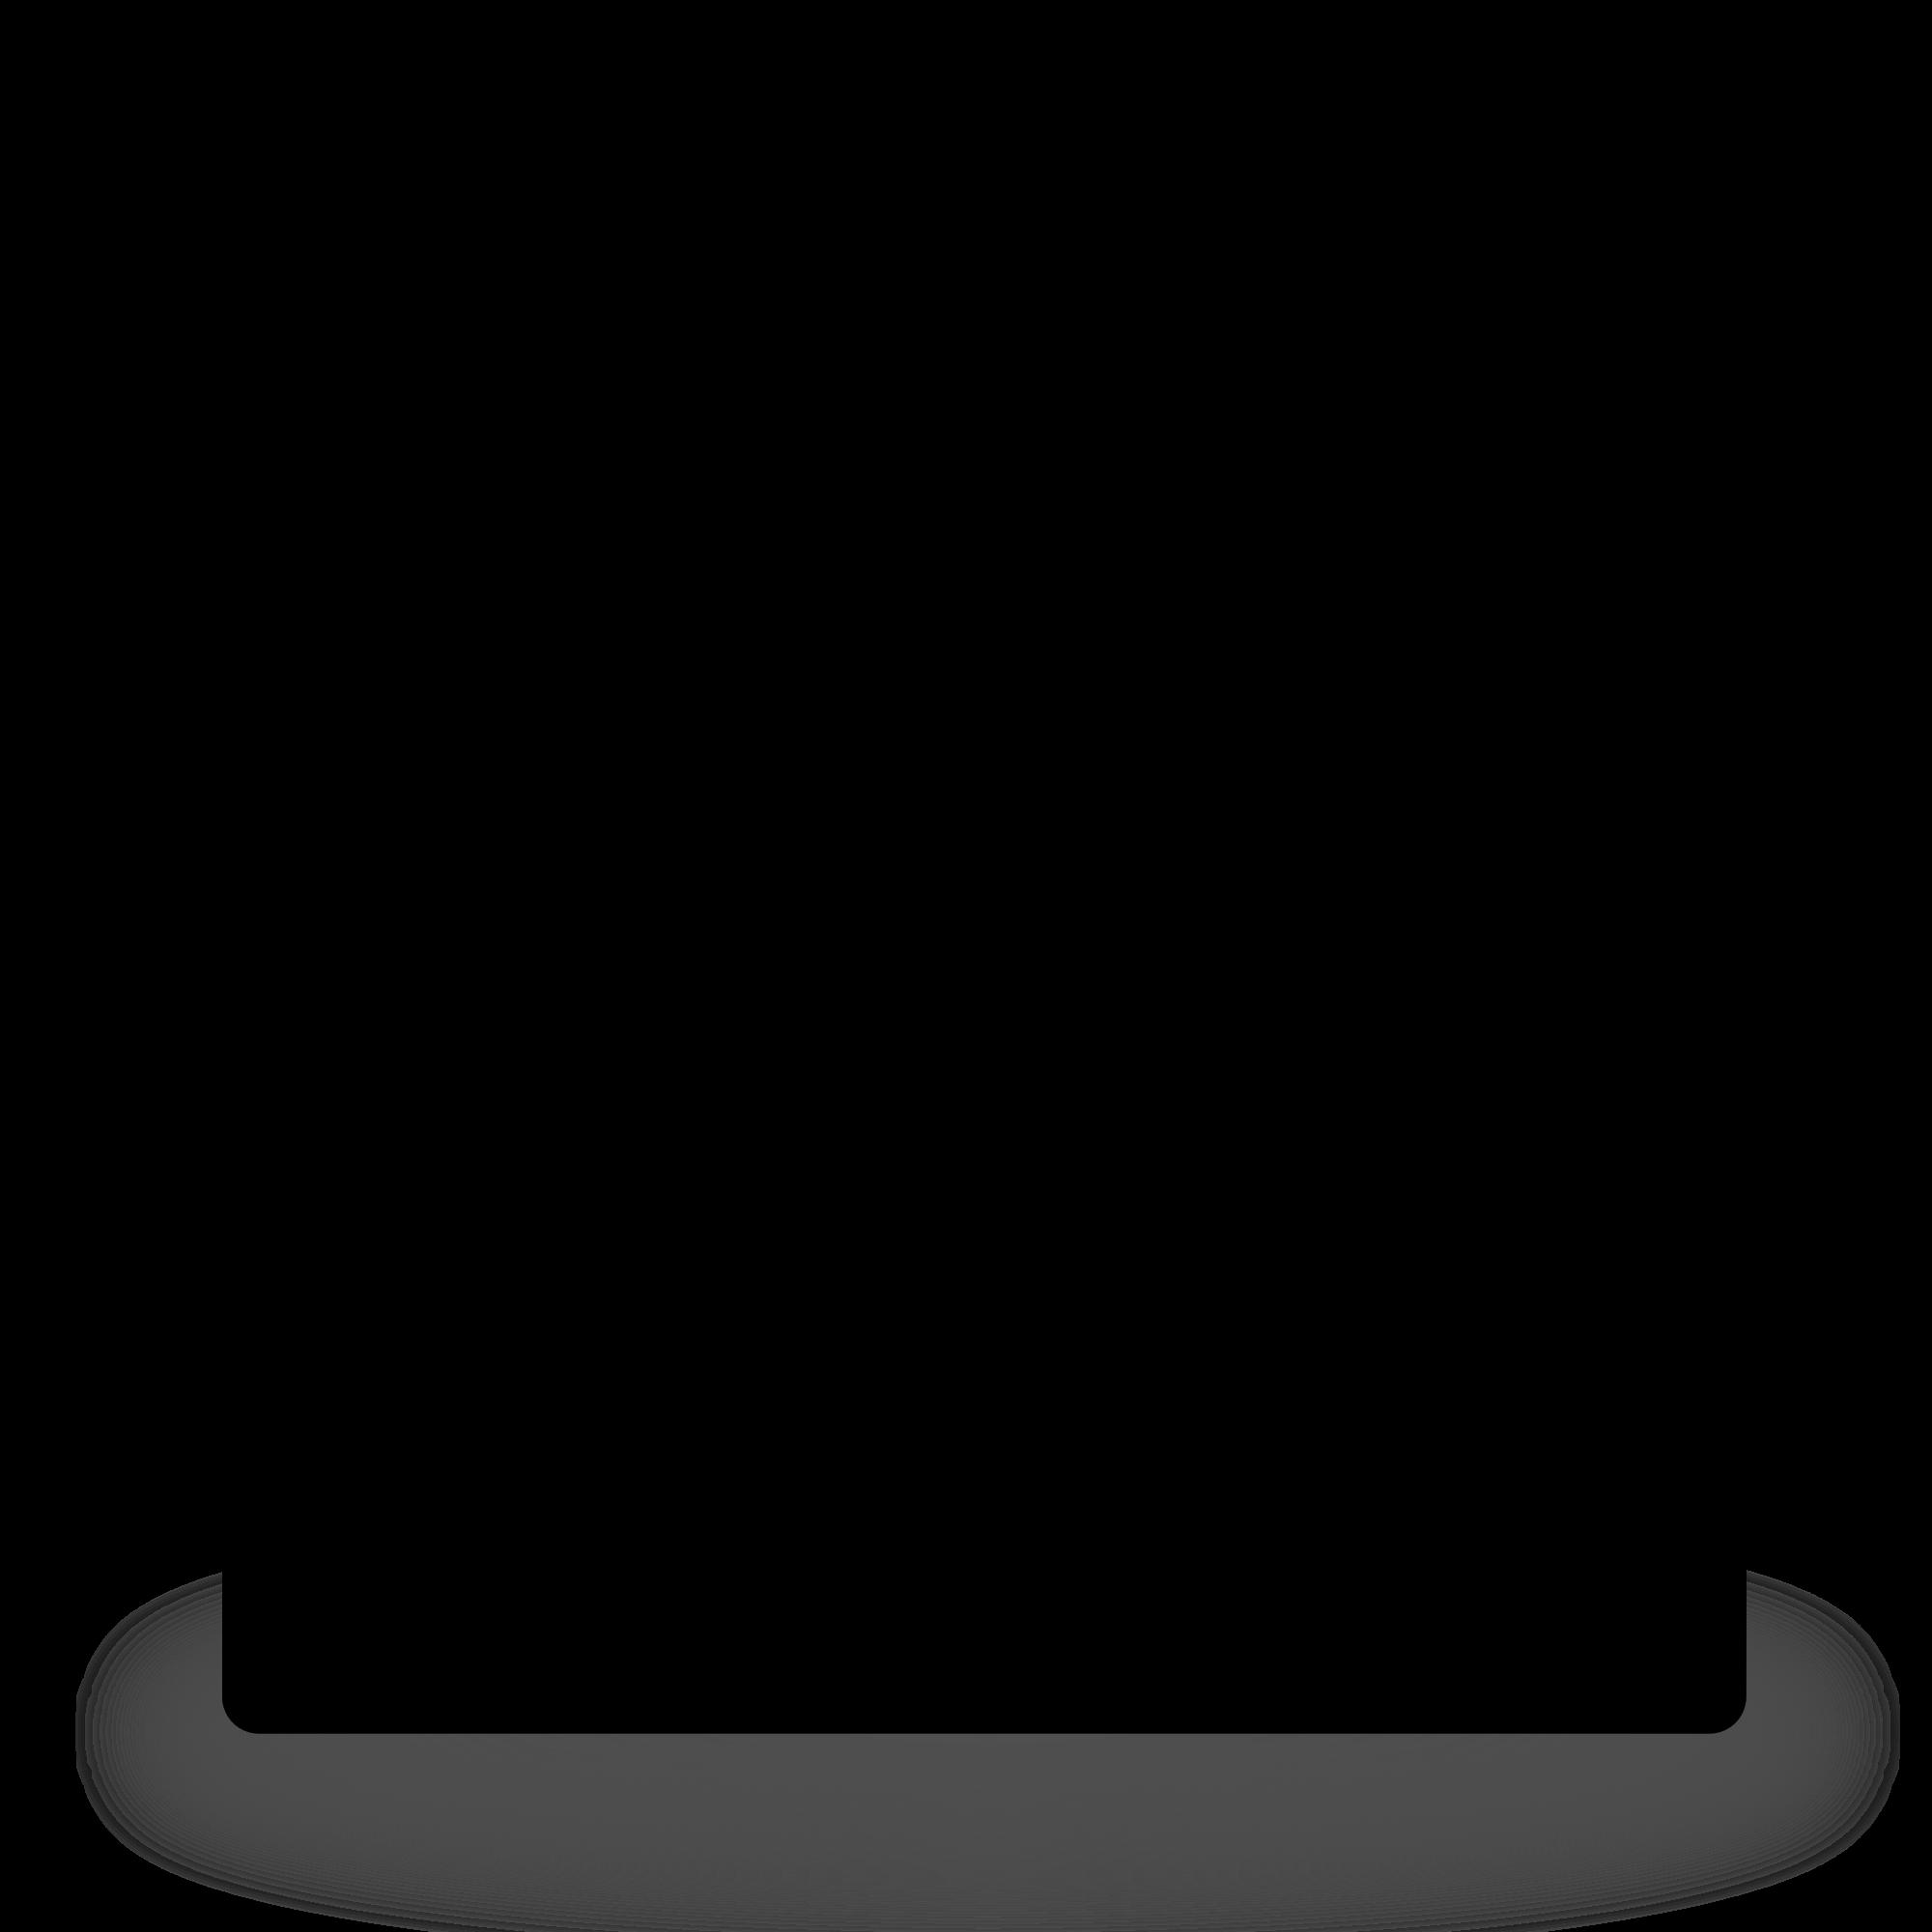 File clapboard svg wikimedia. Film clipart clap board